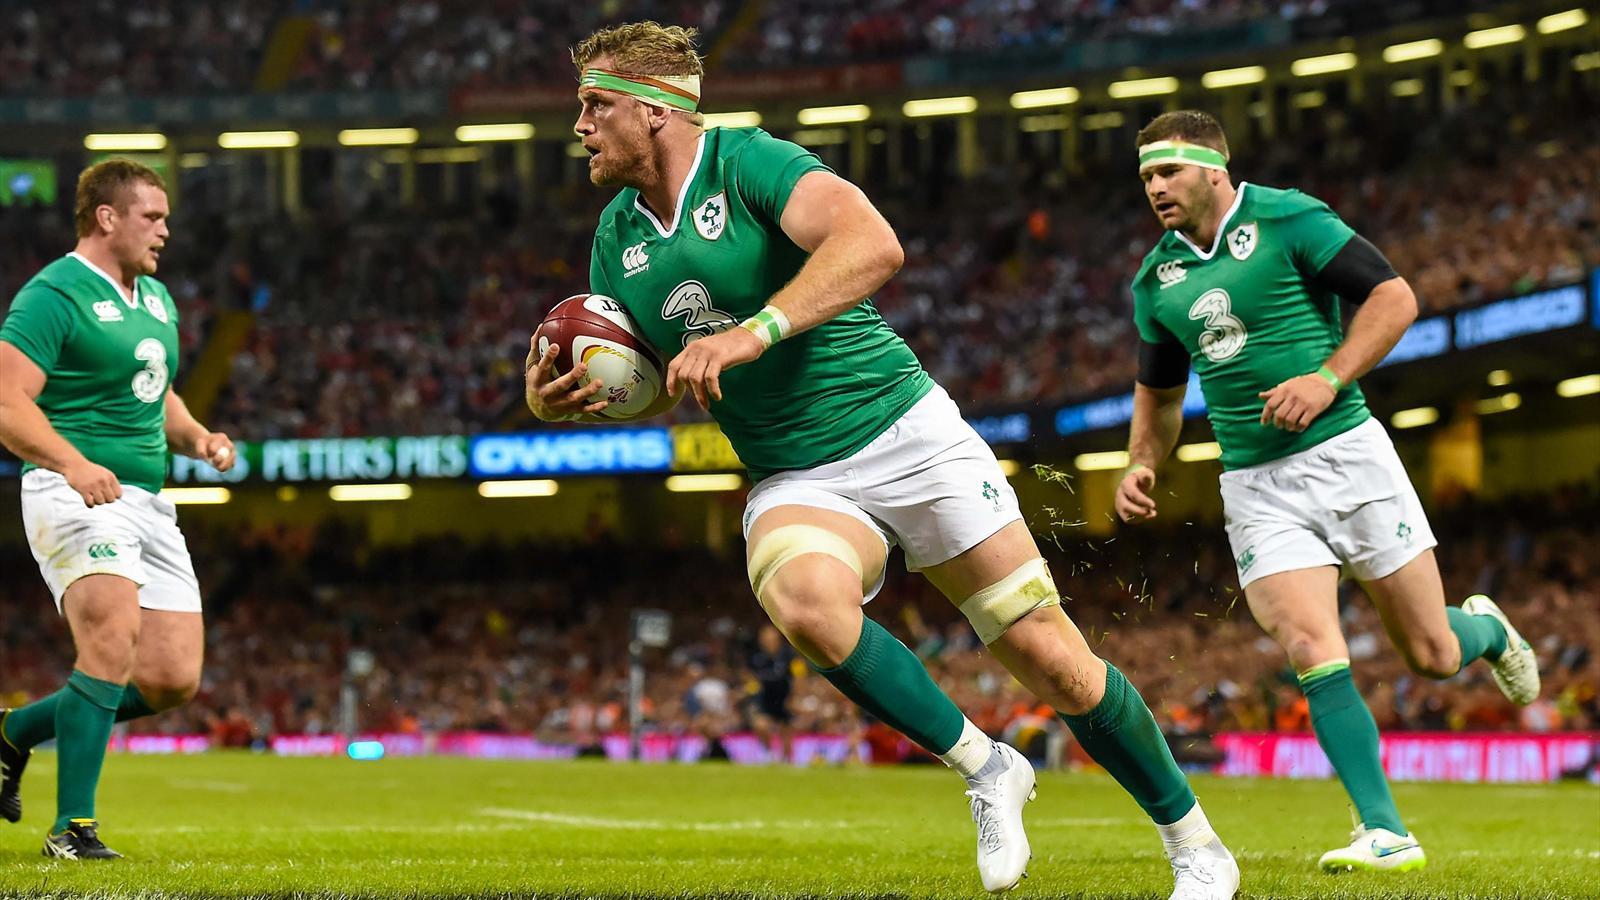 Jamie Heaslip (Irlande) face au pays de Galles - 8 août 2015